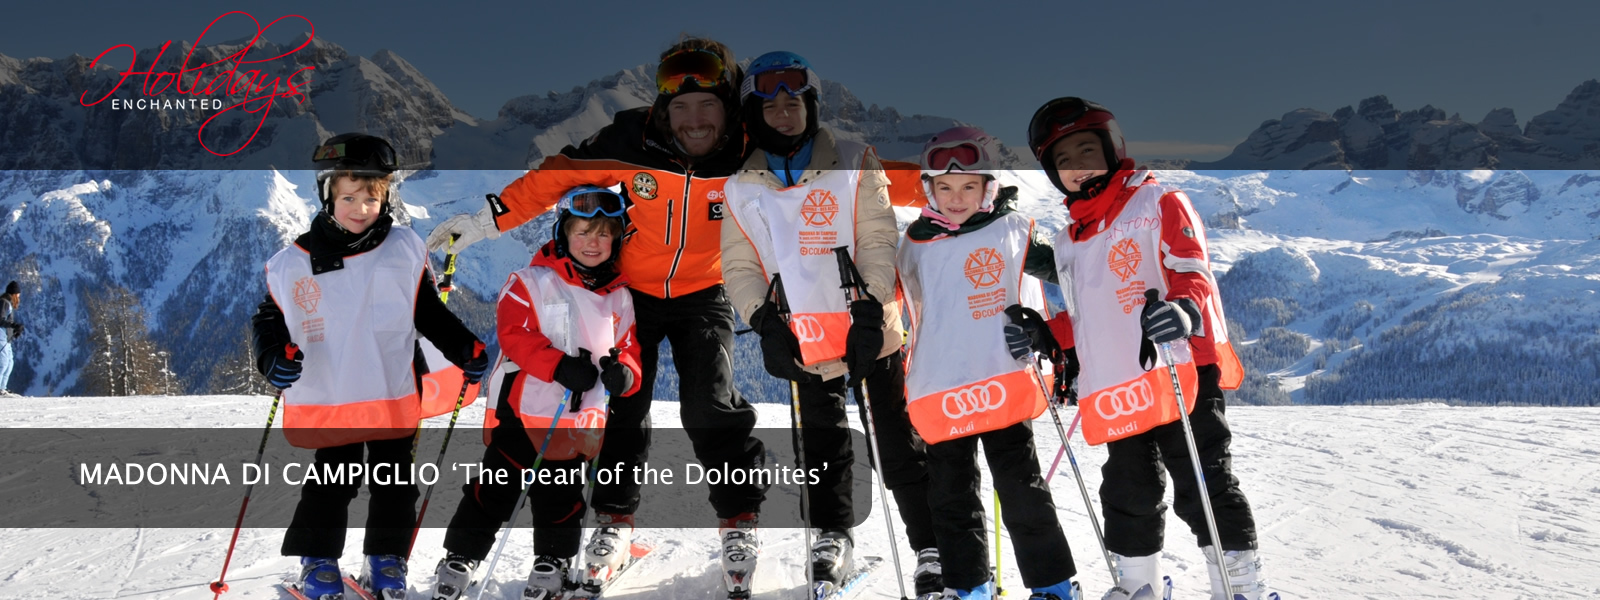 Ski School and Ski Instructor at Madonna di Campiglio